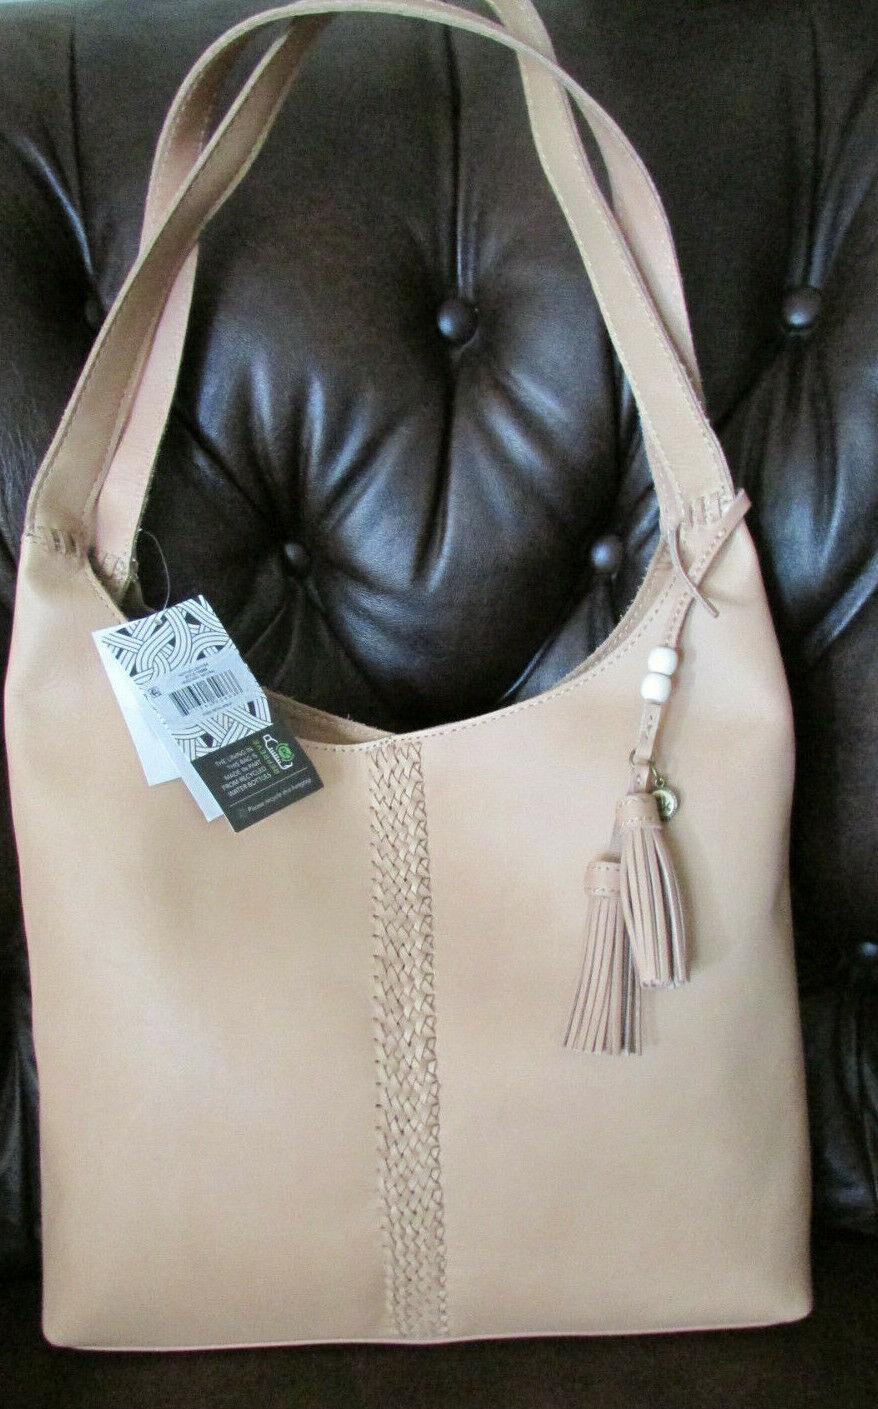 The Sak Vachetta LEATHER Veg Tan Huntley Hobo Shoulder bag in Natural NWT